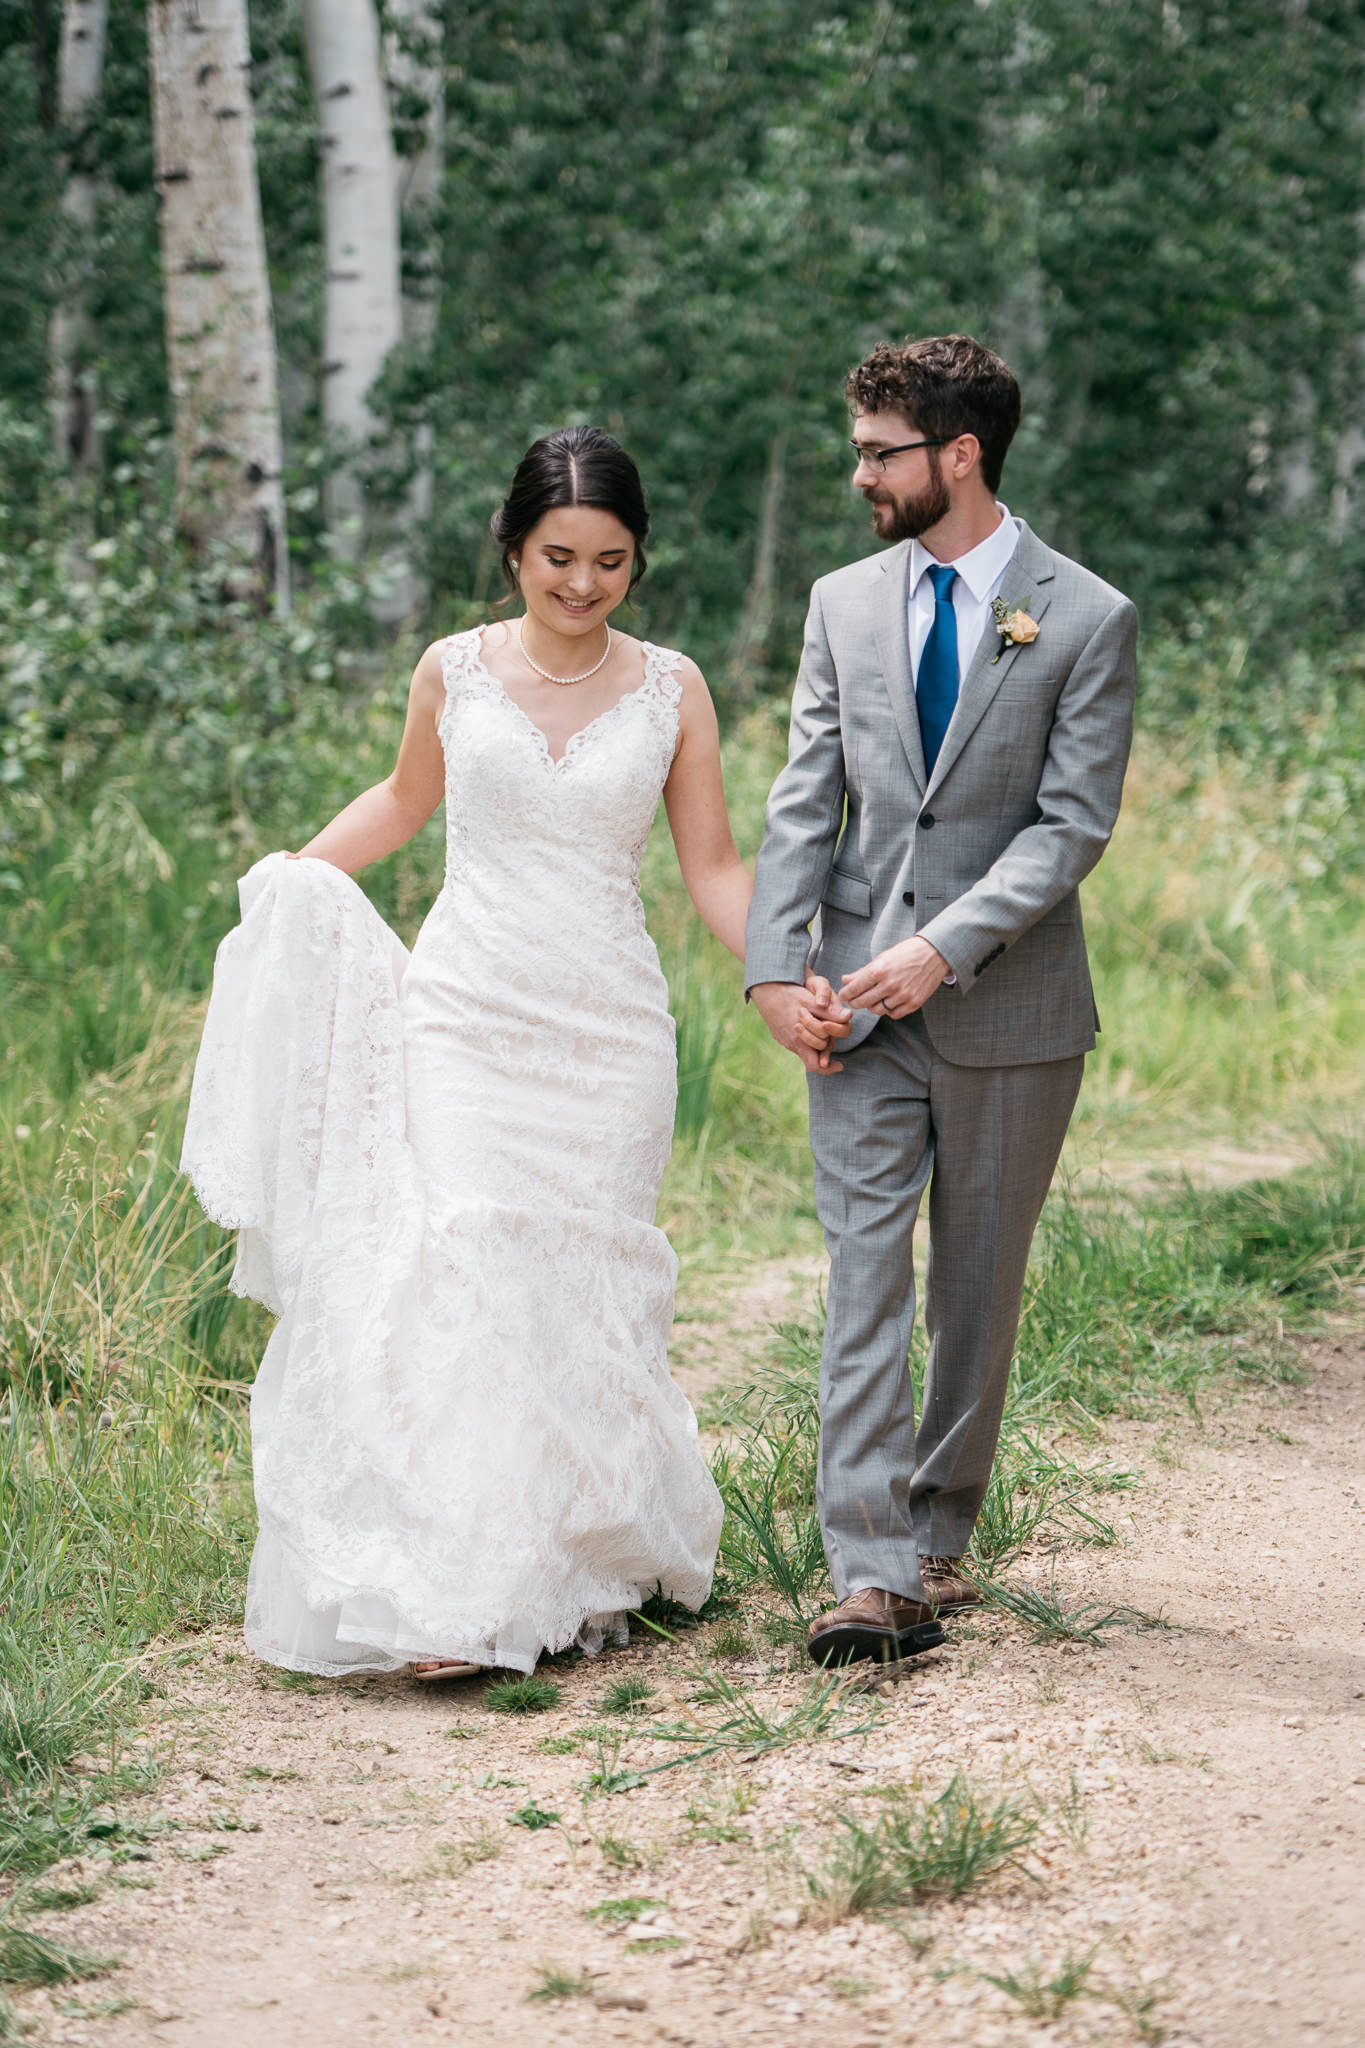 103_ONL_Kat_Nick_Wedding_Trevor_Hooper_Photo.jpg